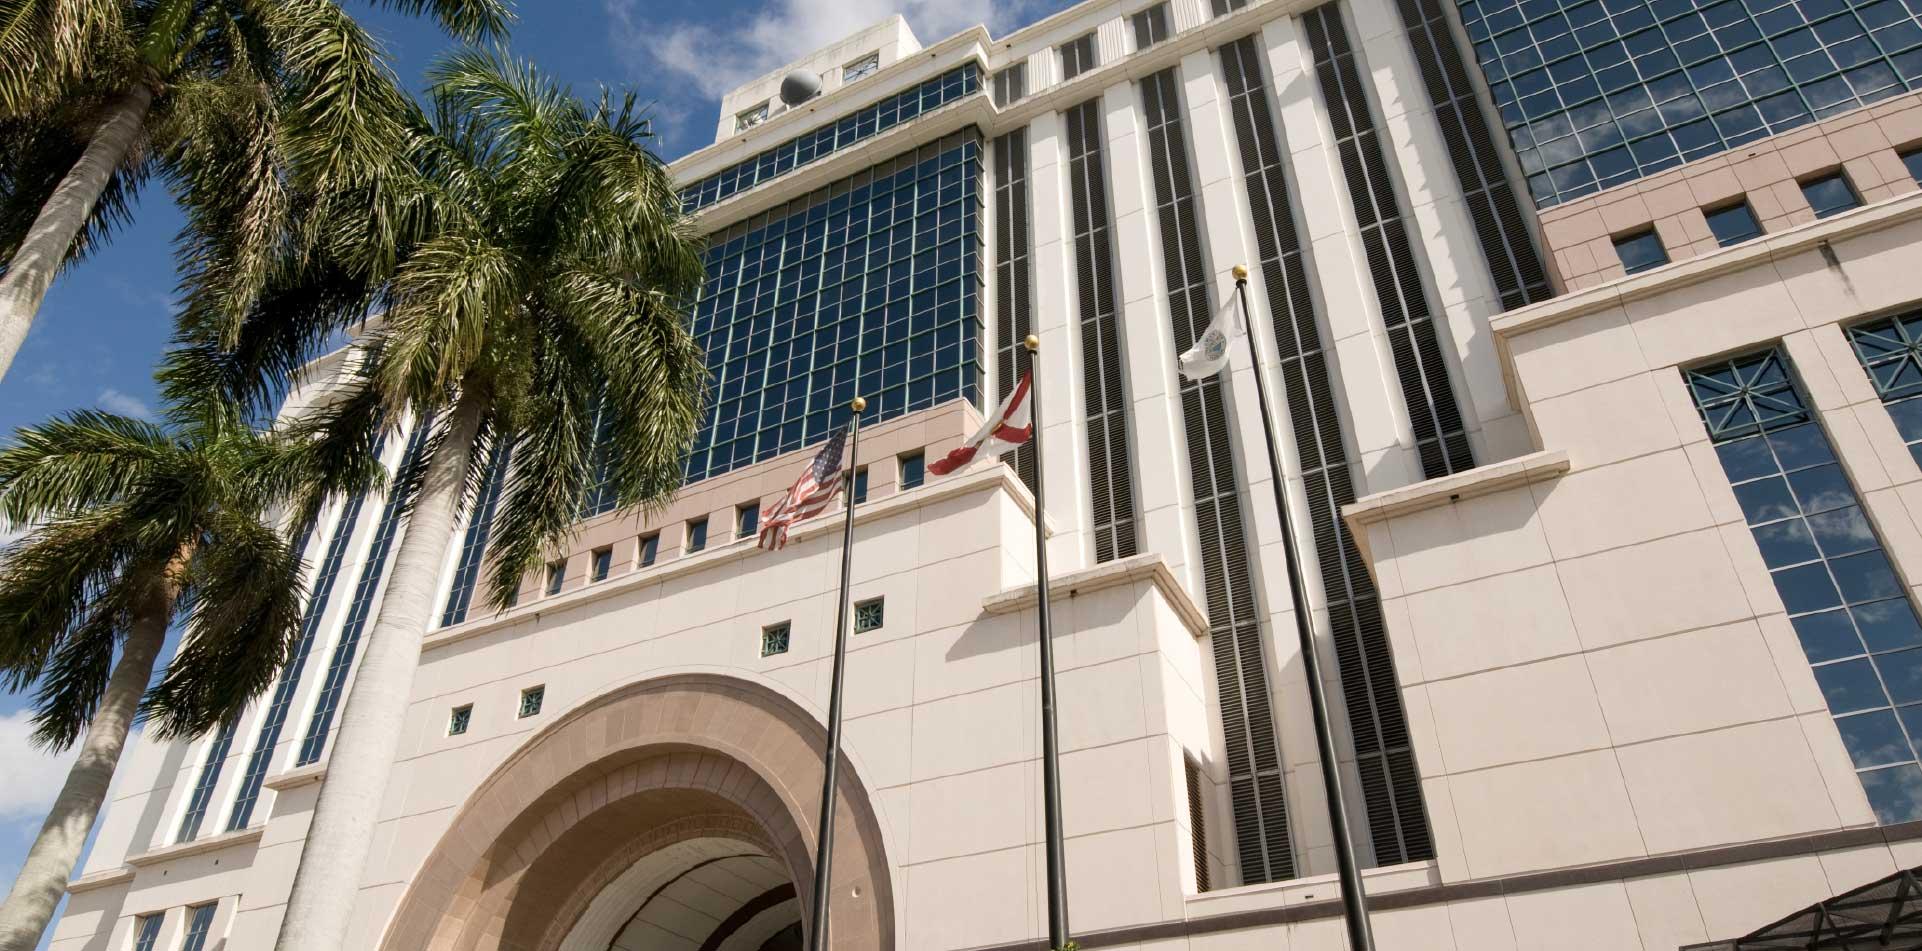 Injury & Accident Lawyer in Jupiter, FL